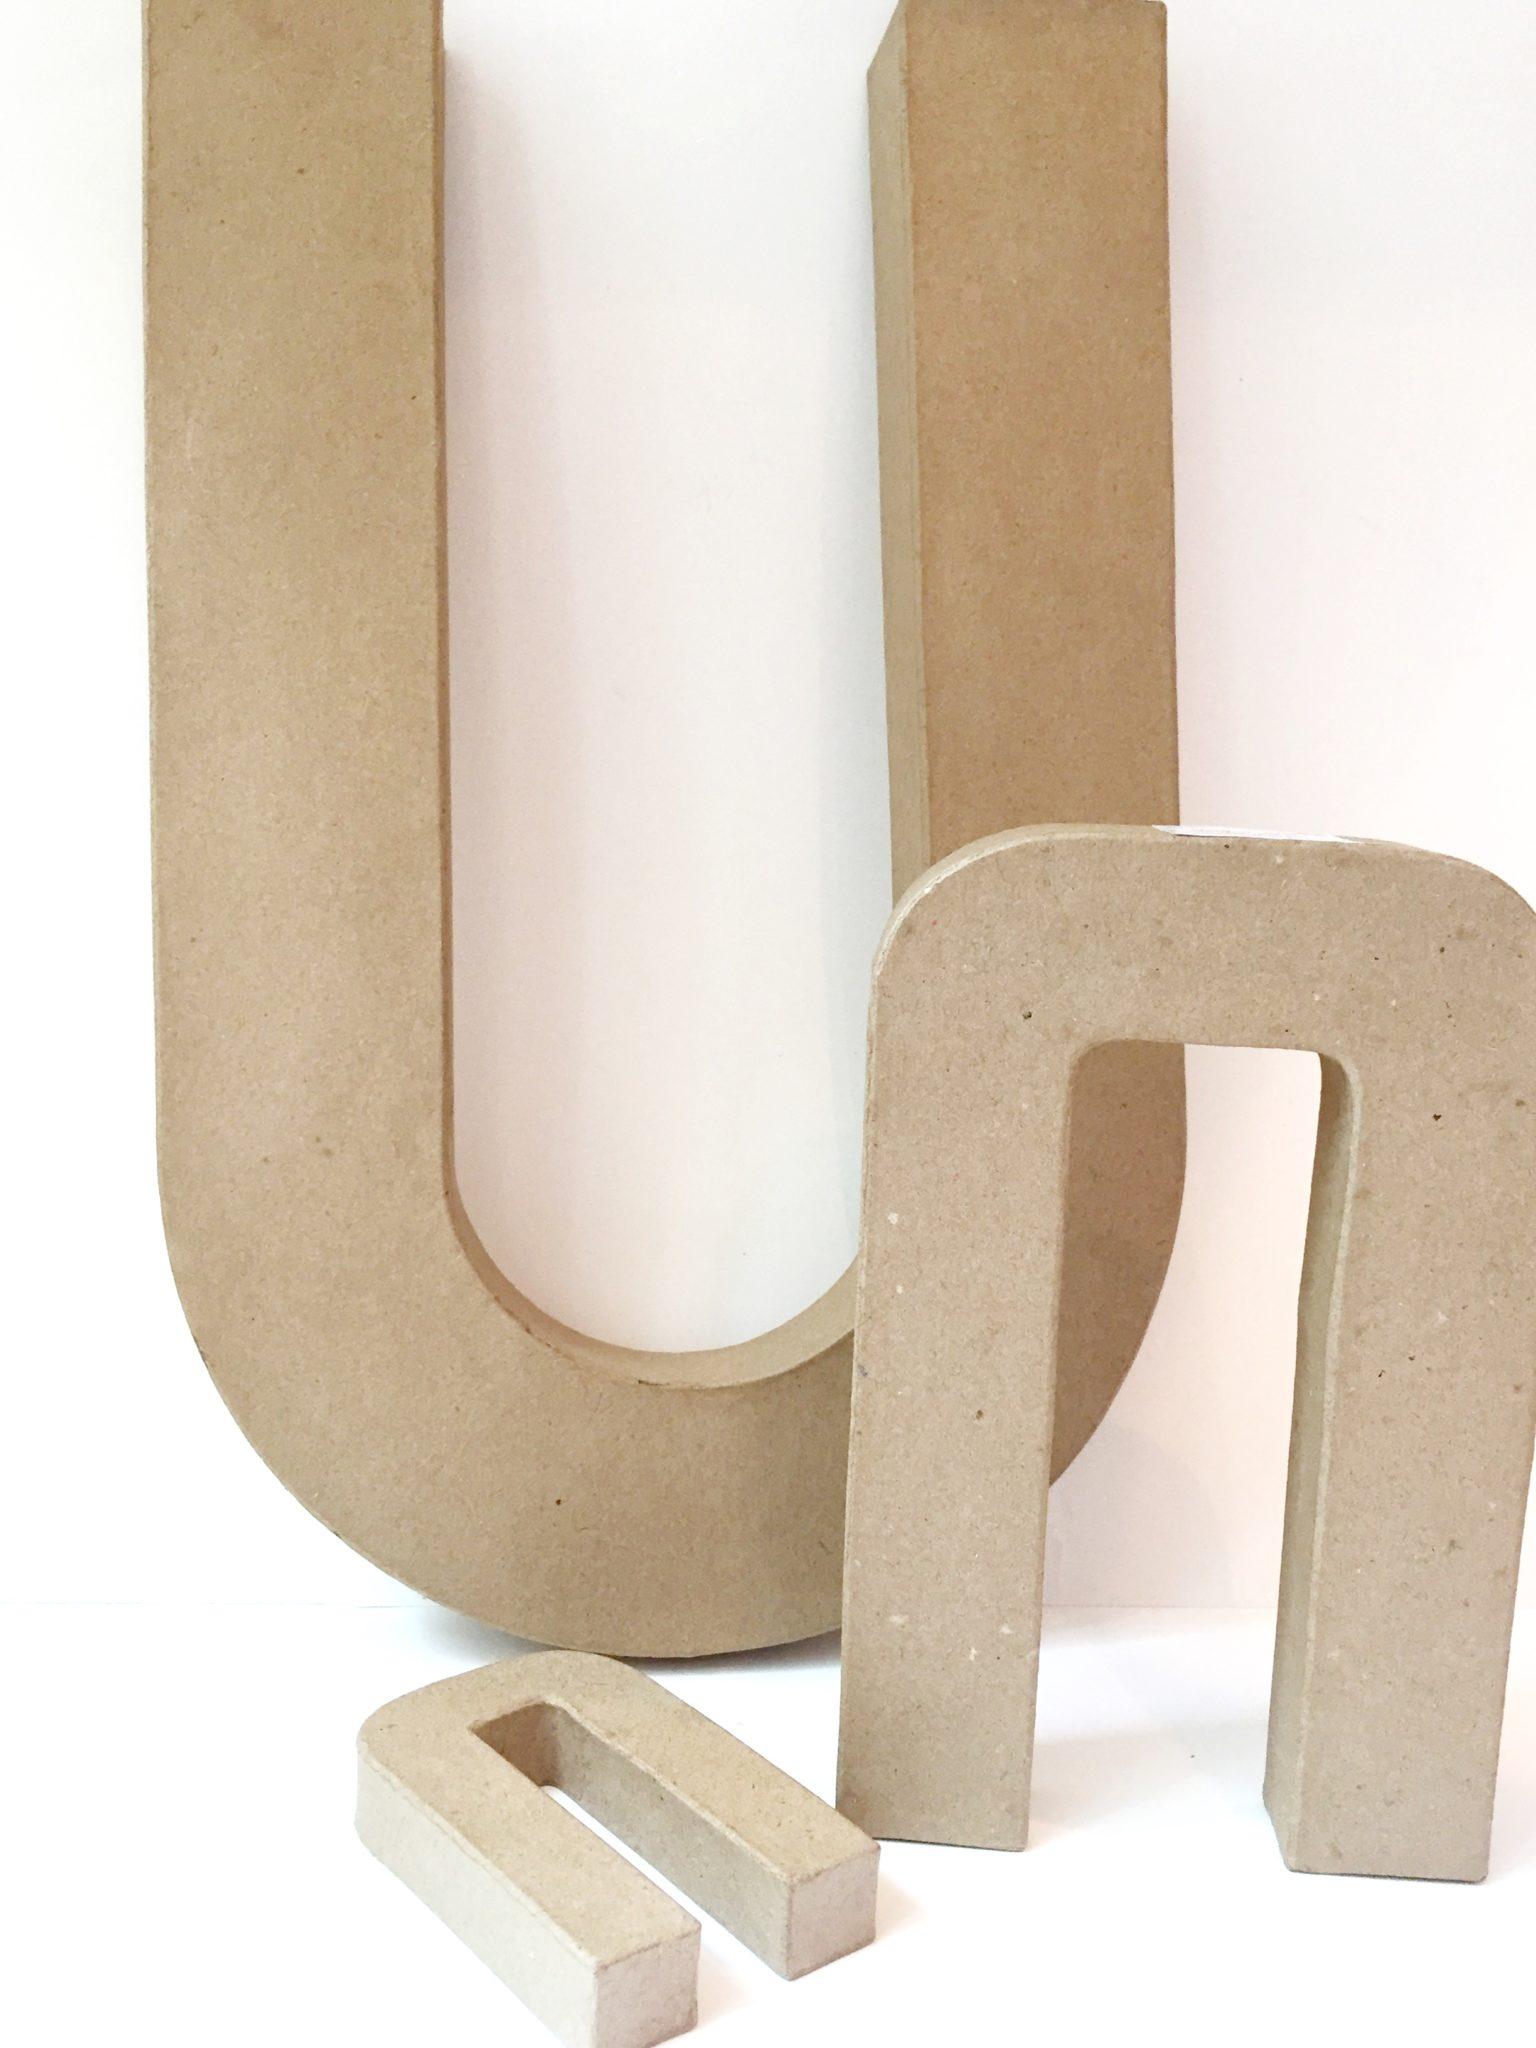 Cardboard letters for crafts.